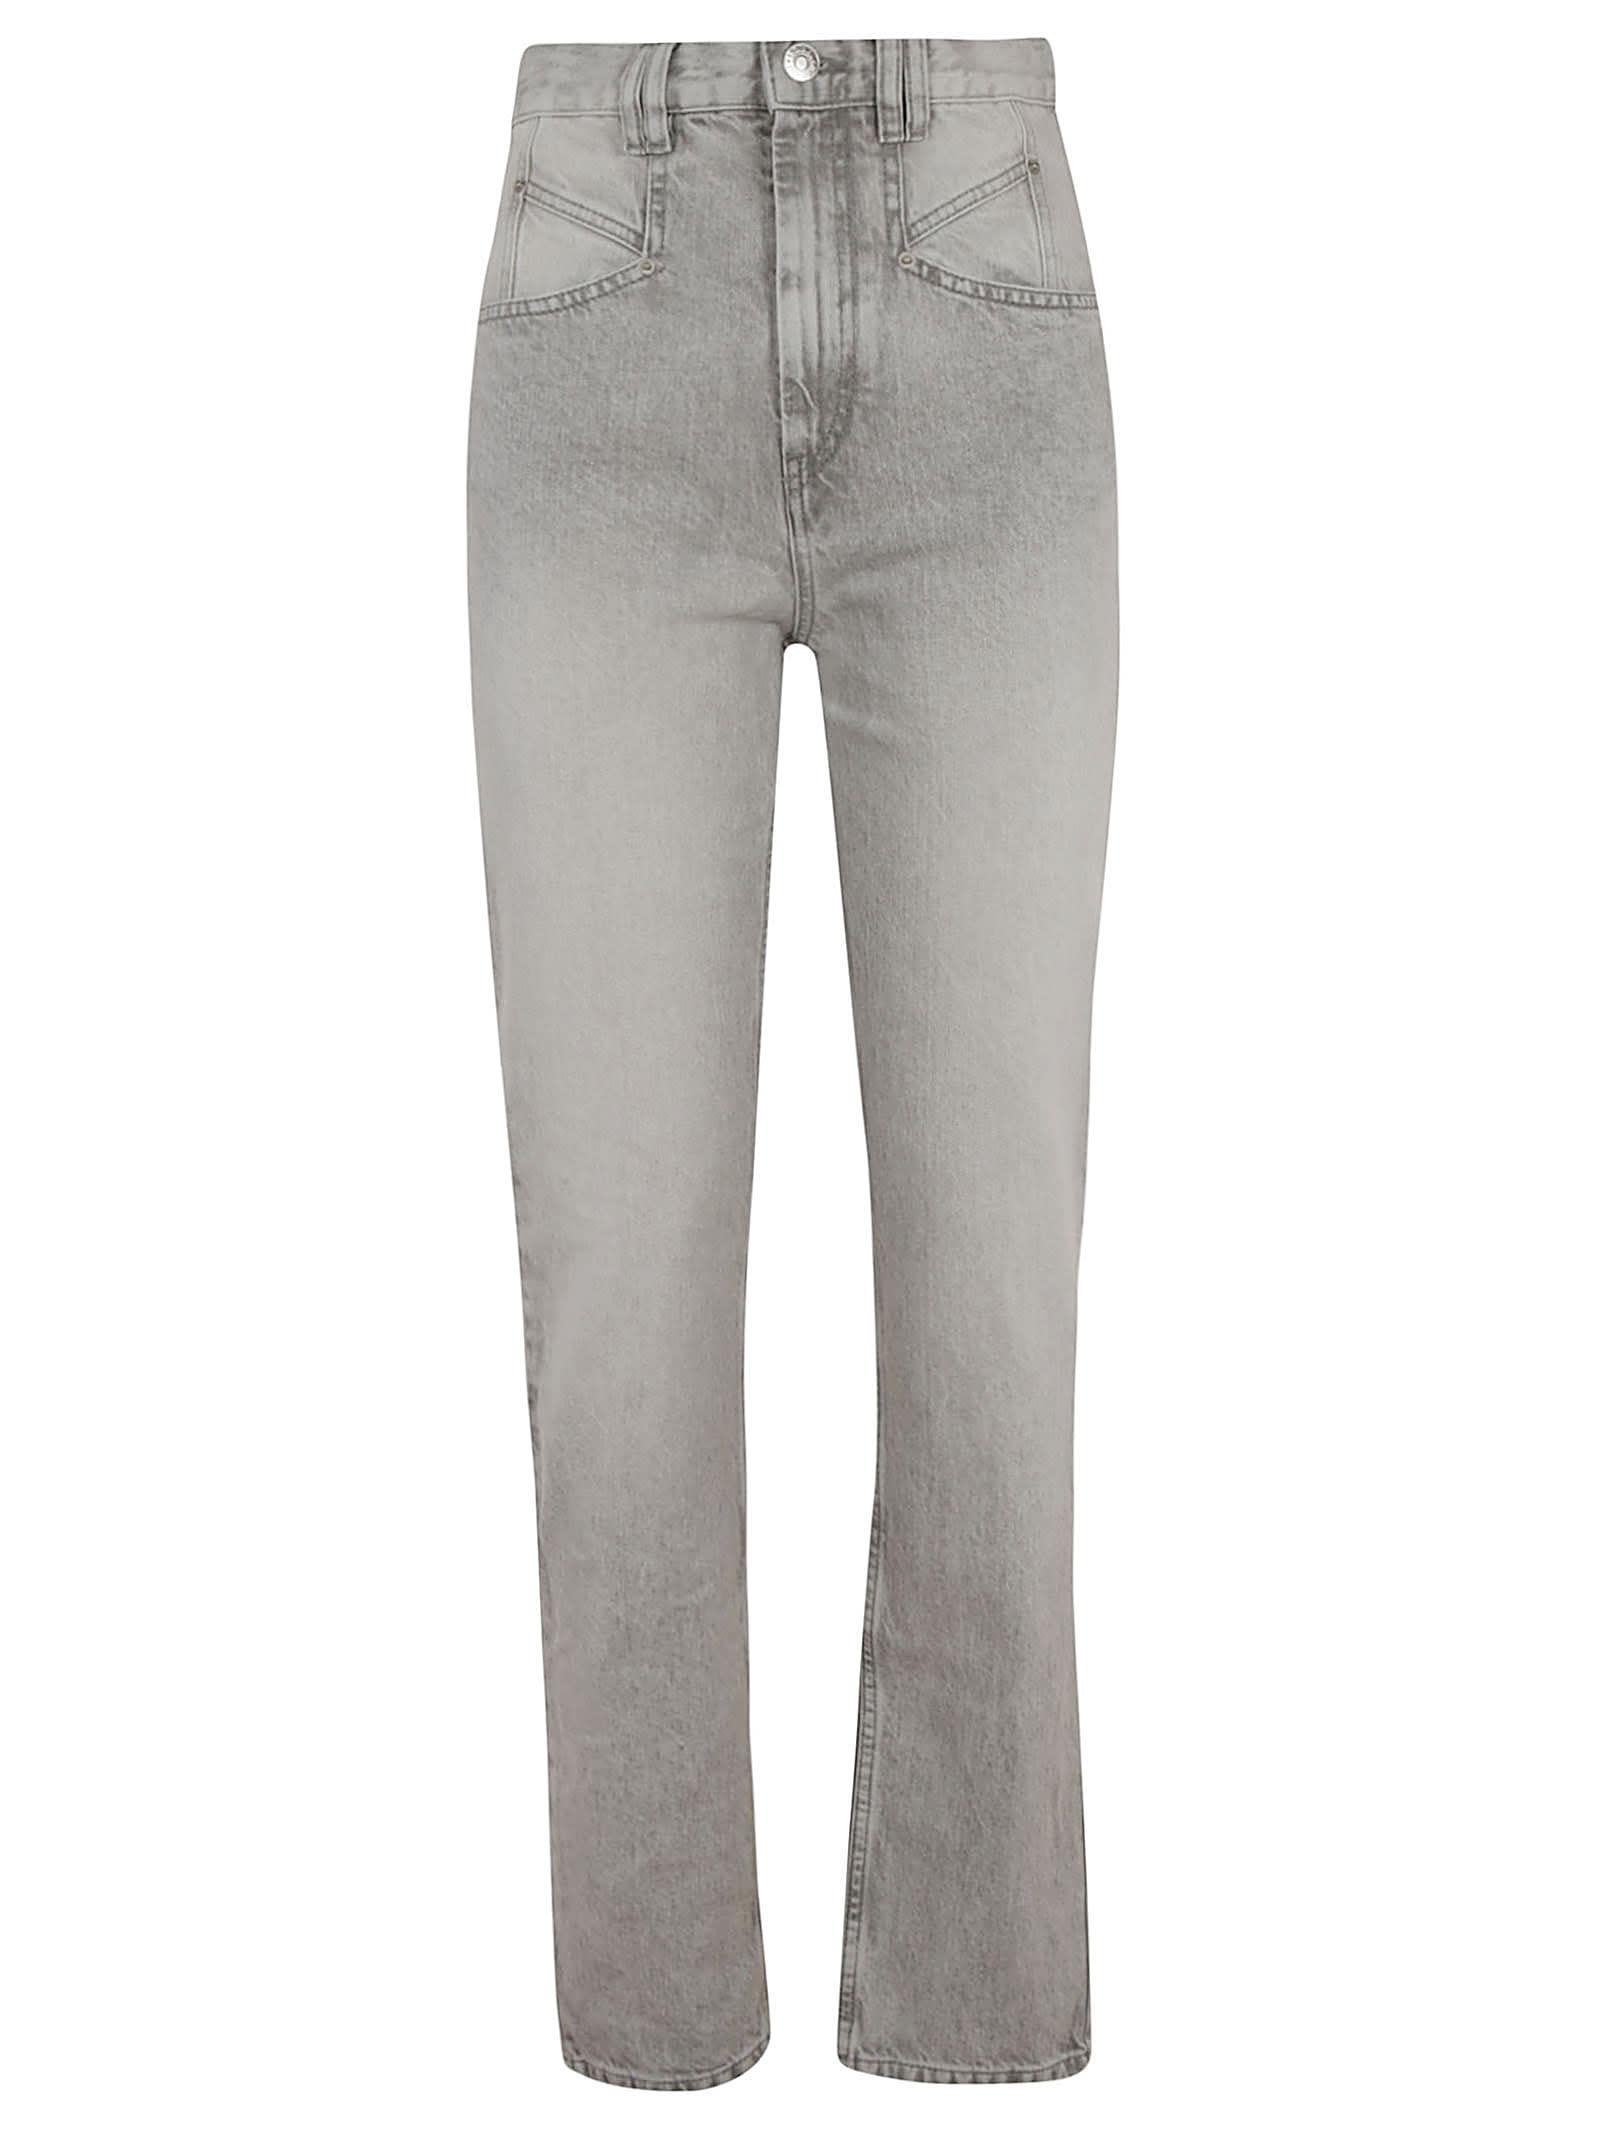 Isabel Marant High Waist Jeans